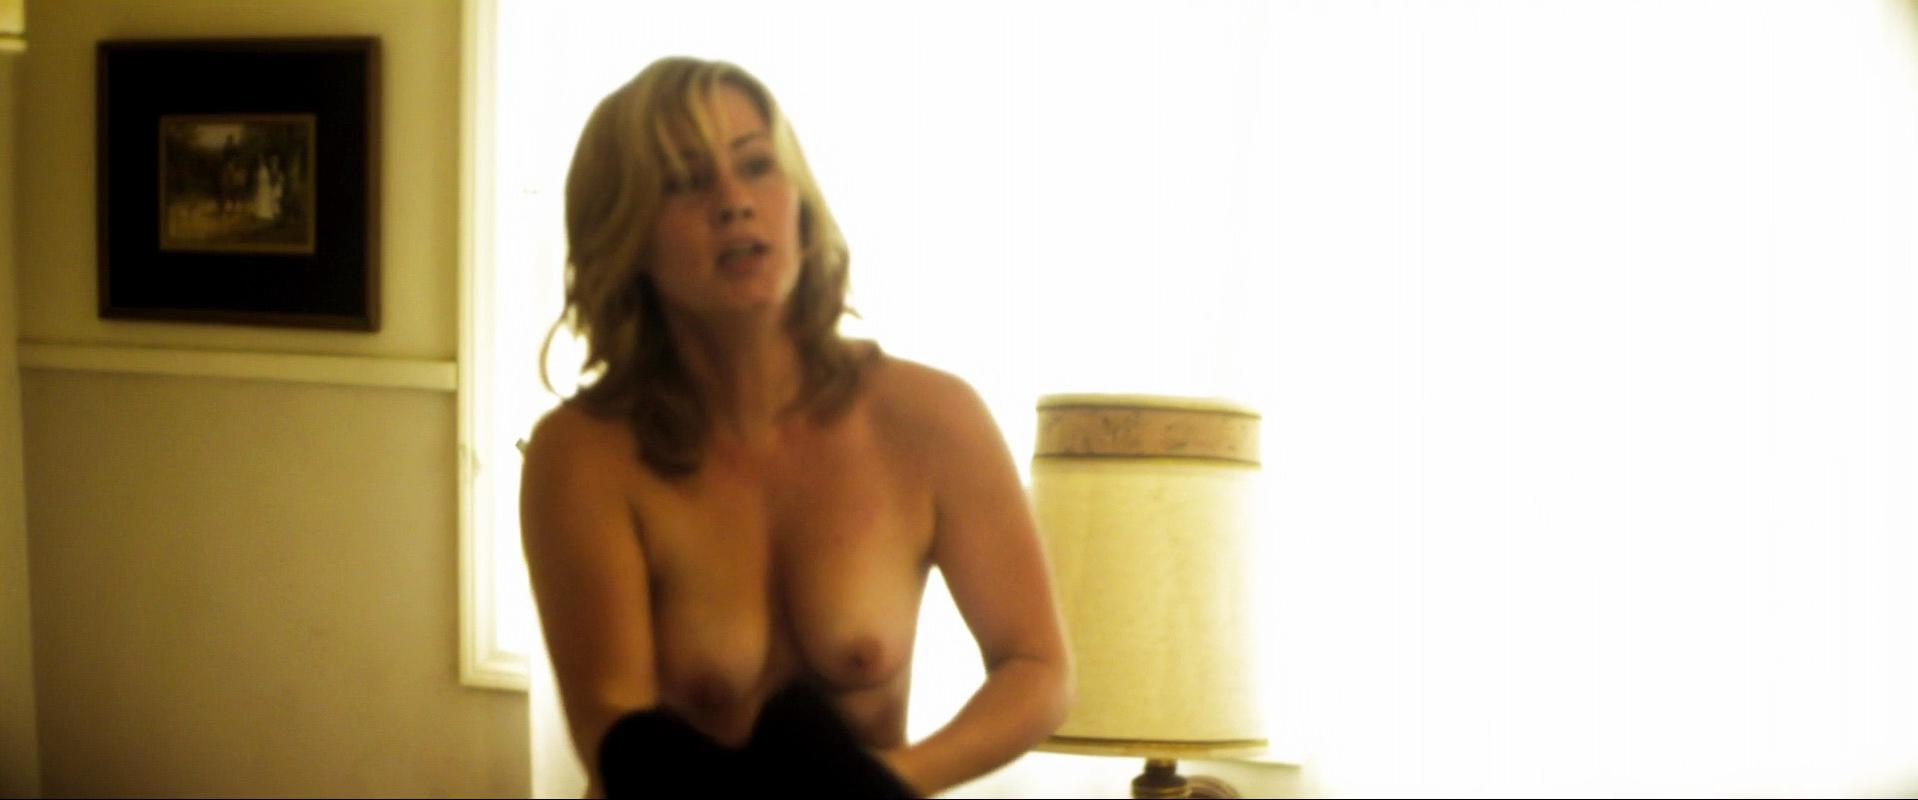 Google jessie wiseman nude pics